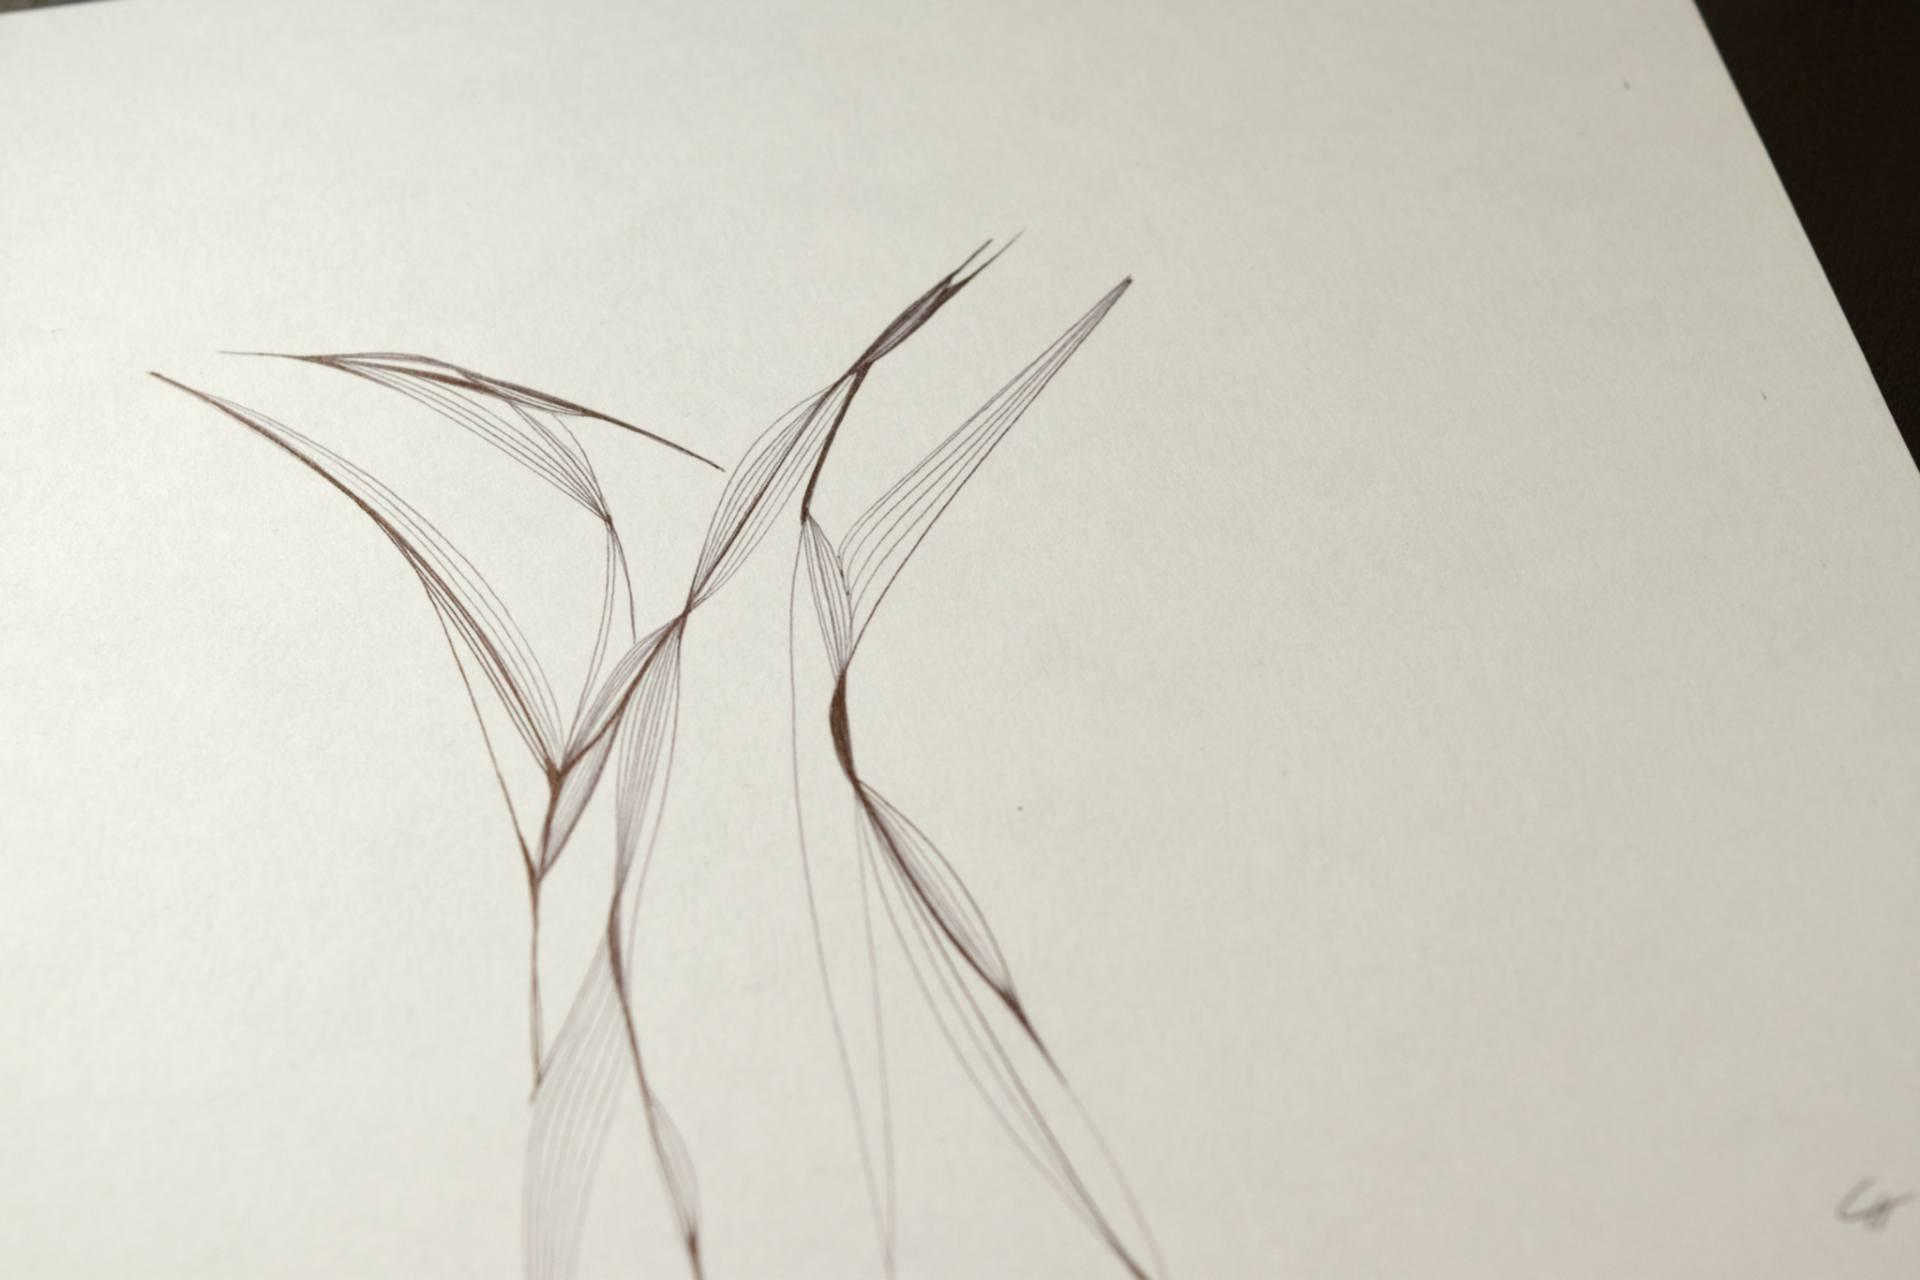 1920x1280 Saatchi Art Meet Amp Hugs Drawing By Natalia Samsonova